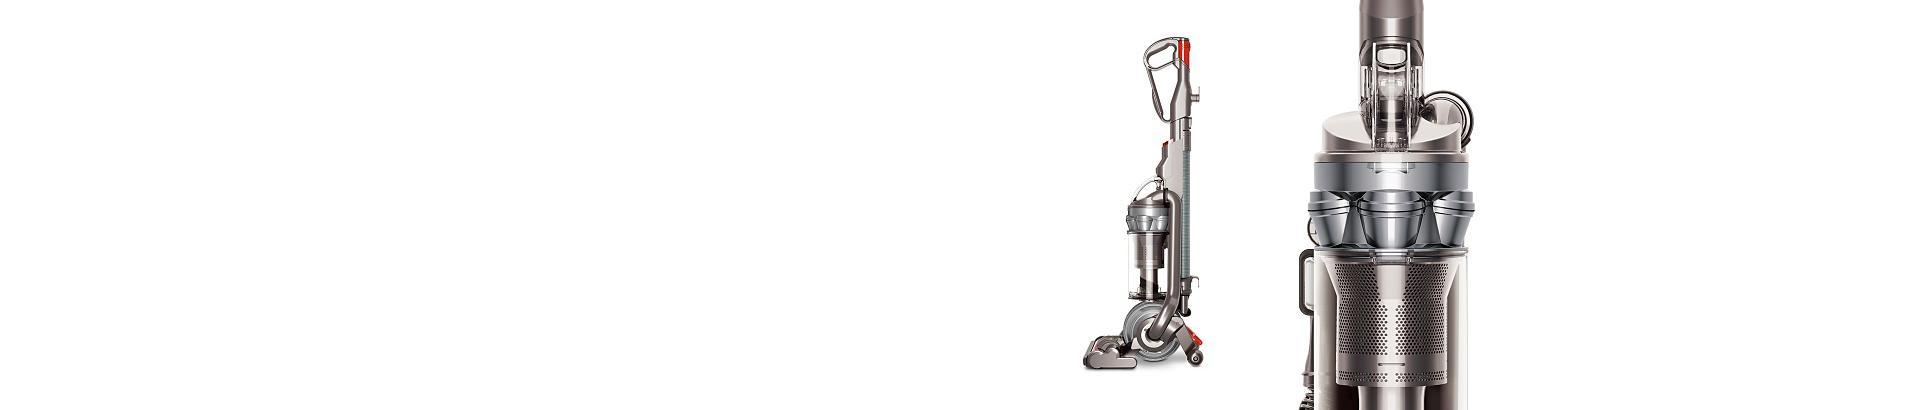 Dyson DC25 vacuums